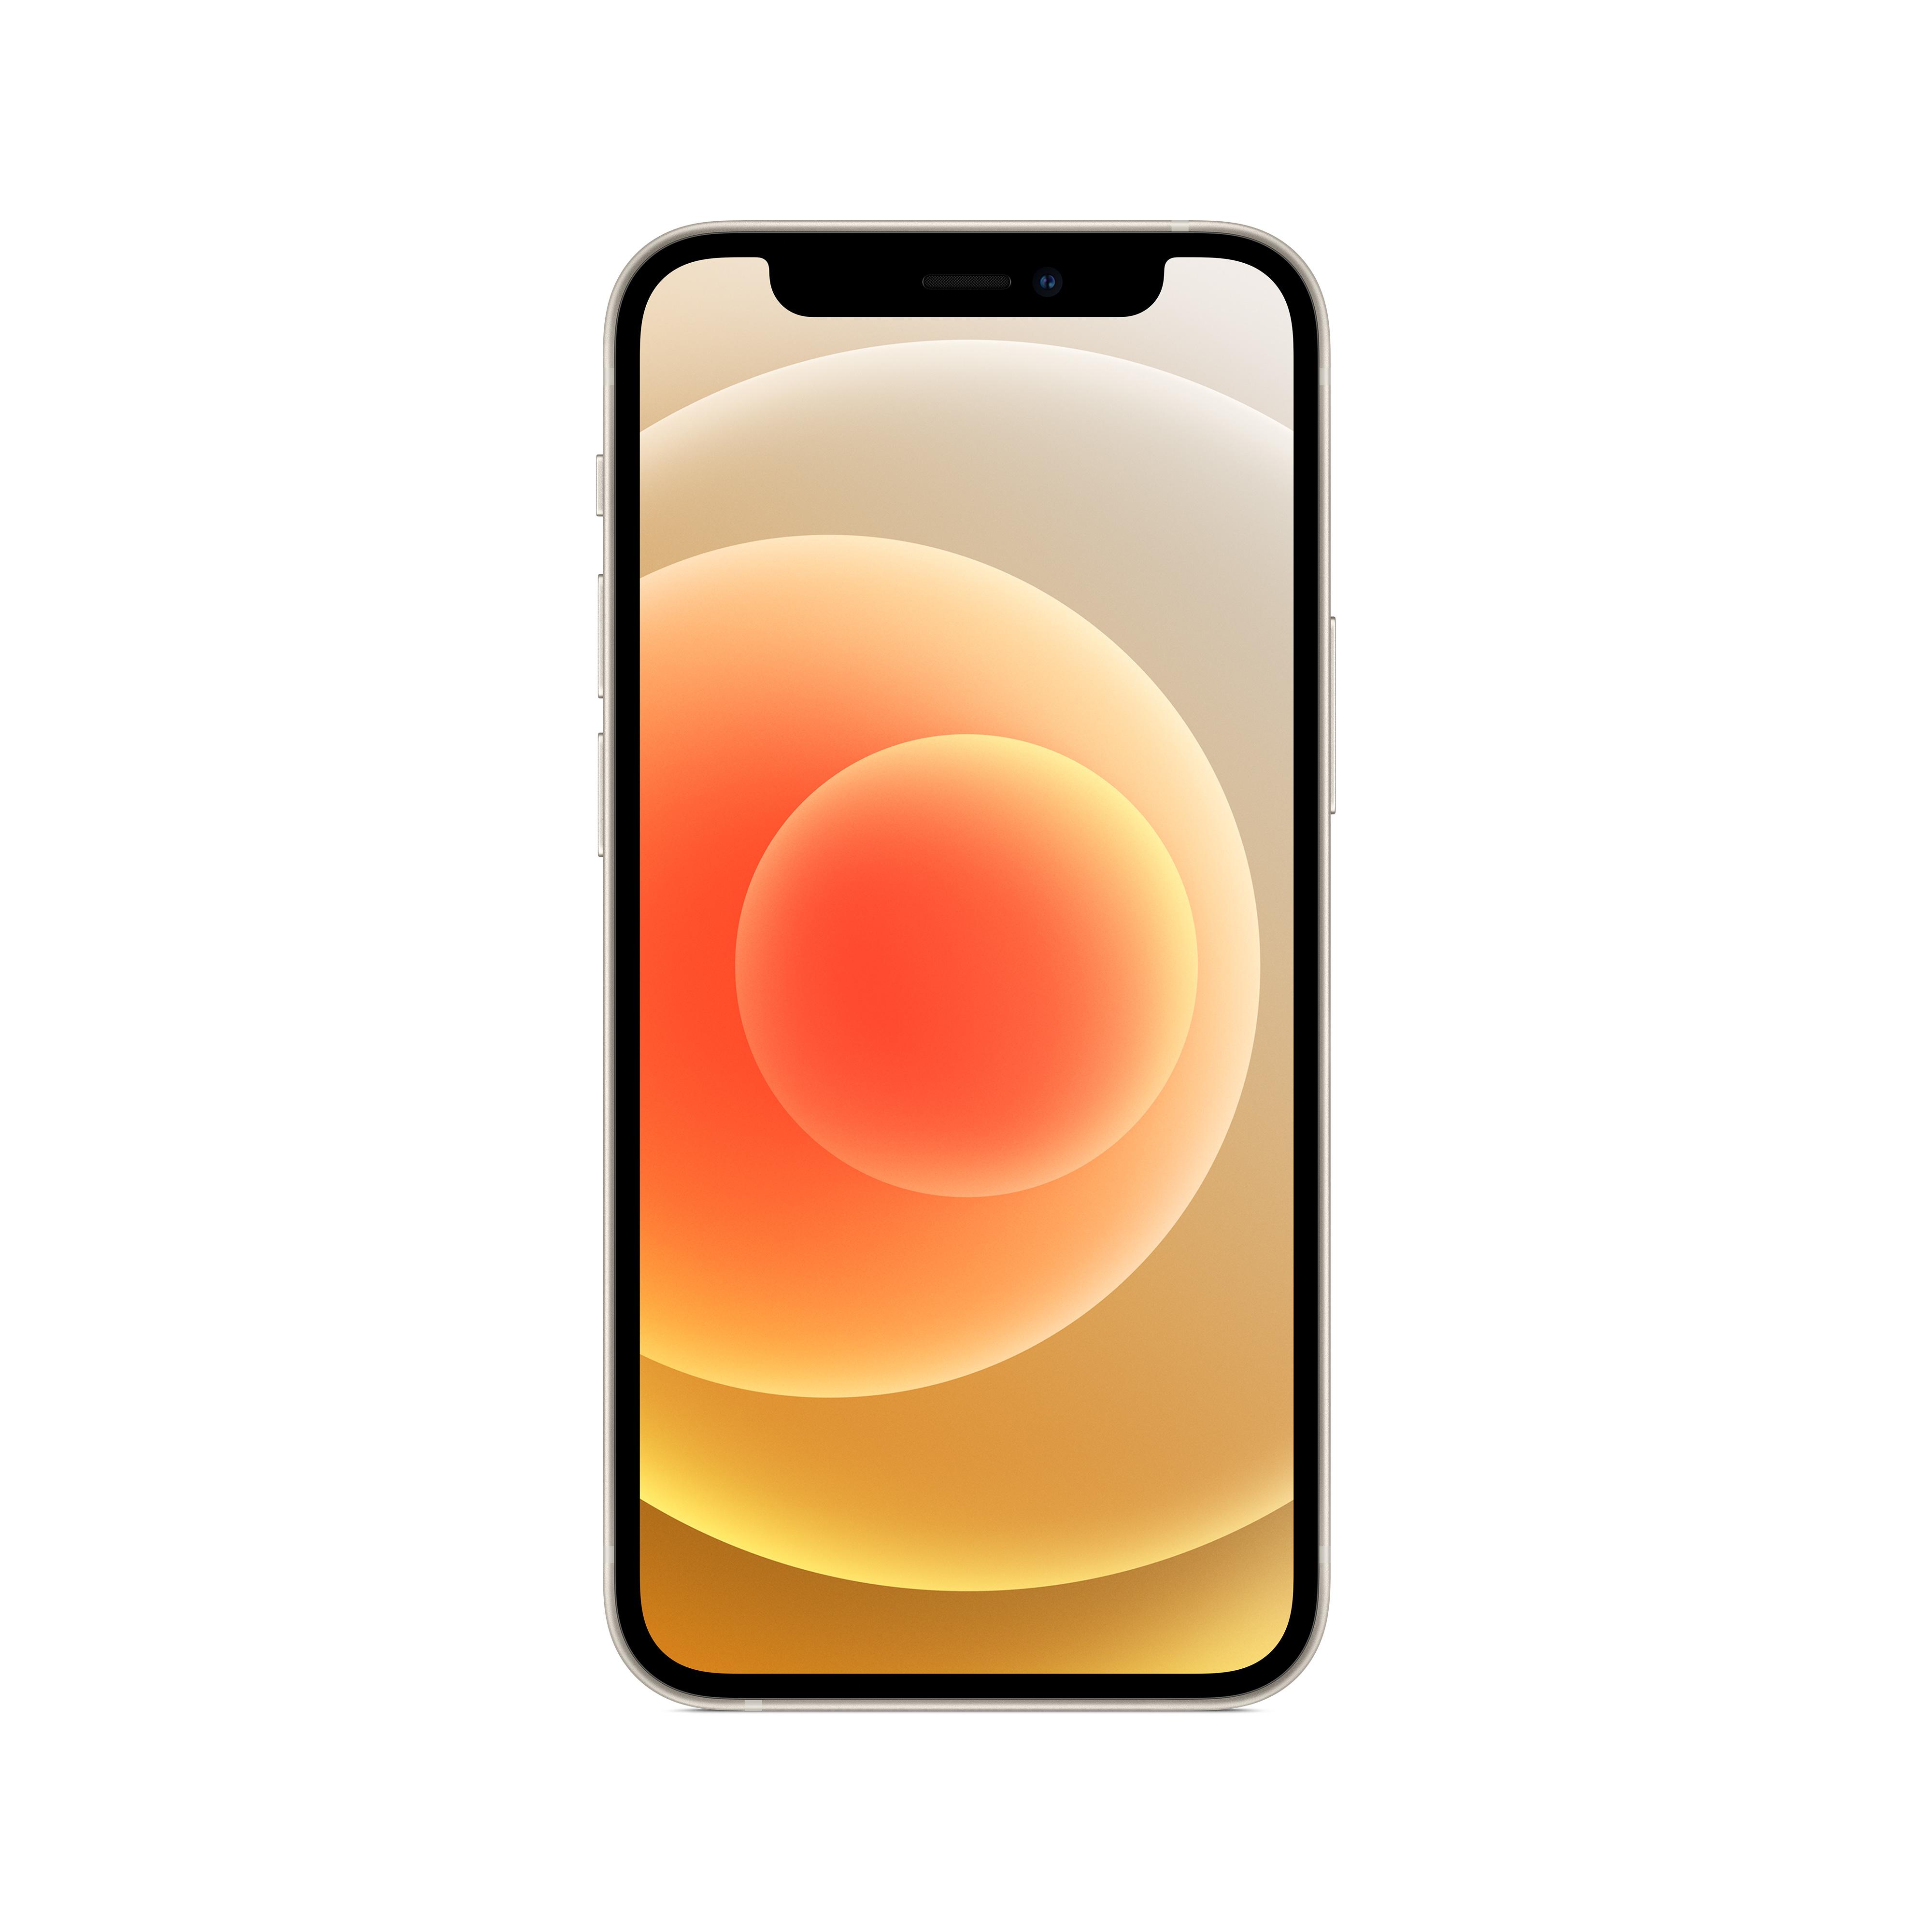 Apple - iPhone 12 Mini 256gb White